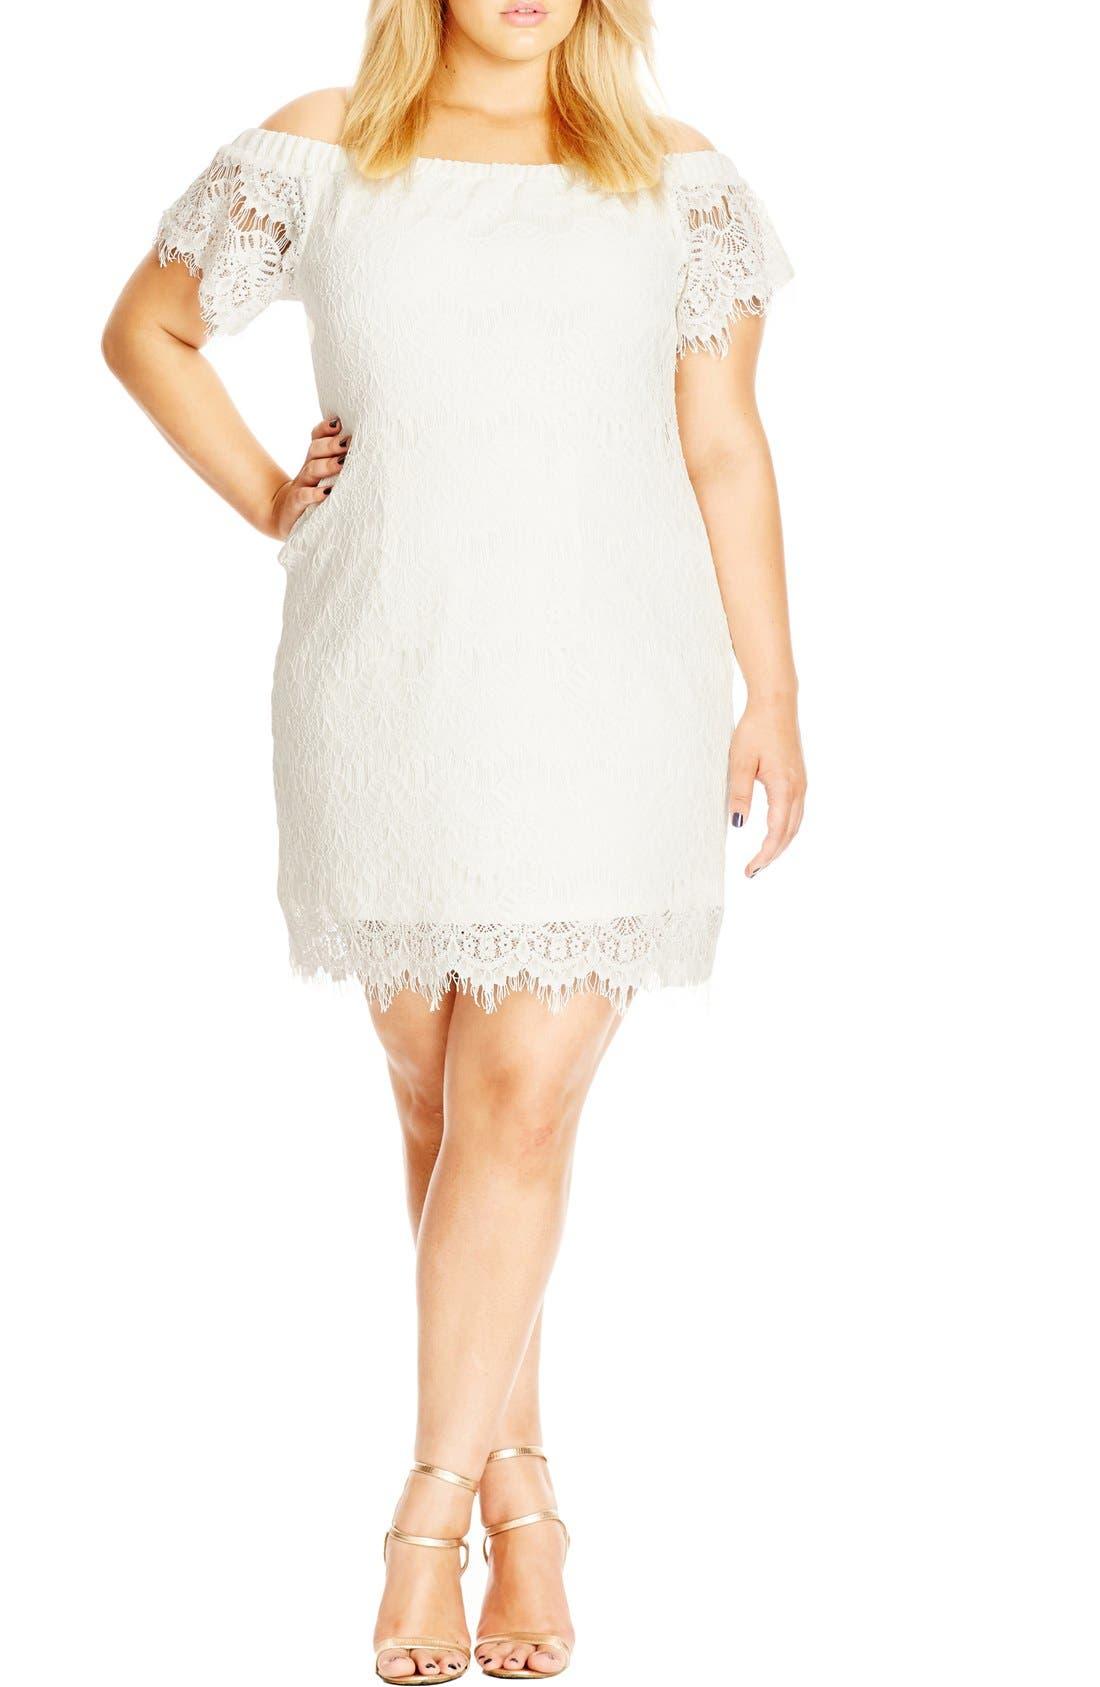 White Cocktail Dresses for Plus Size Women